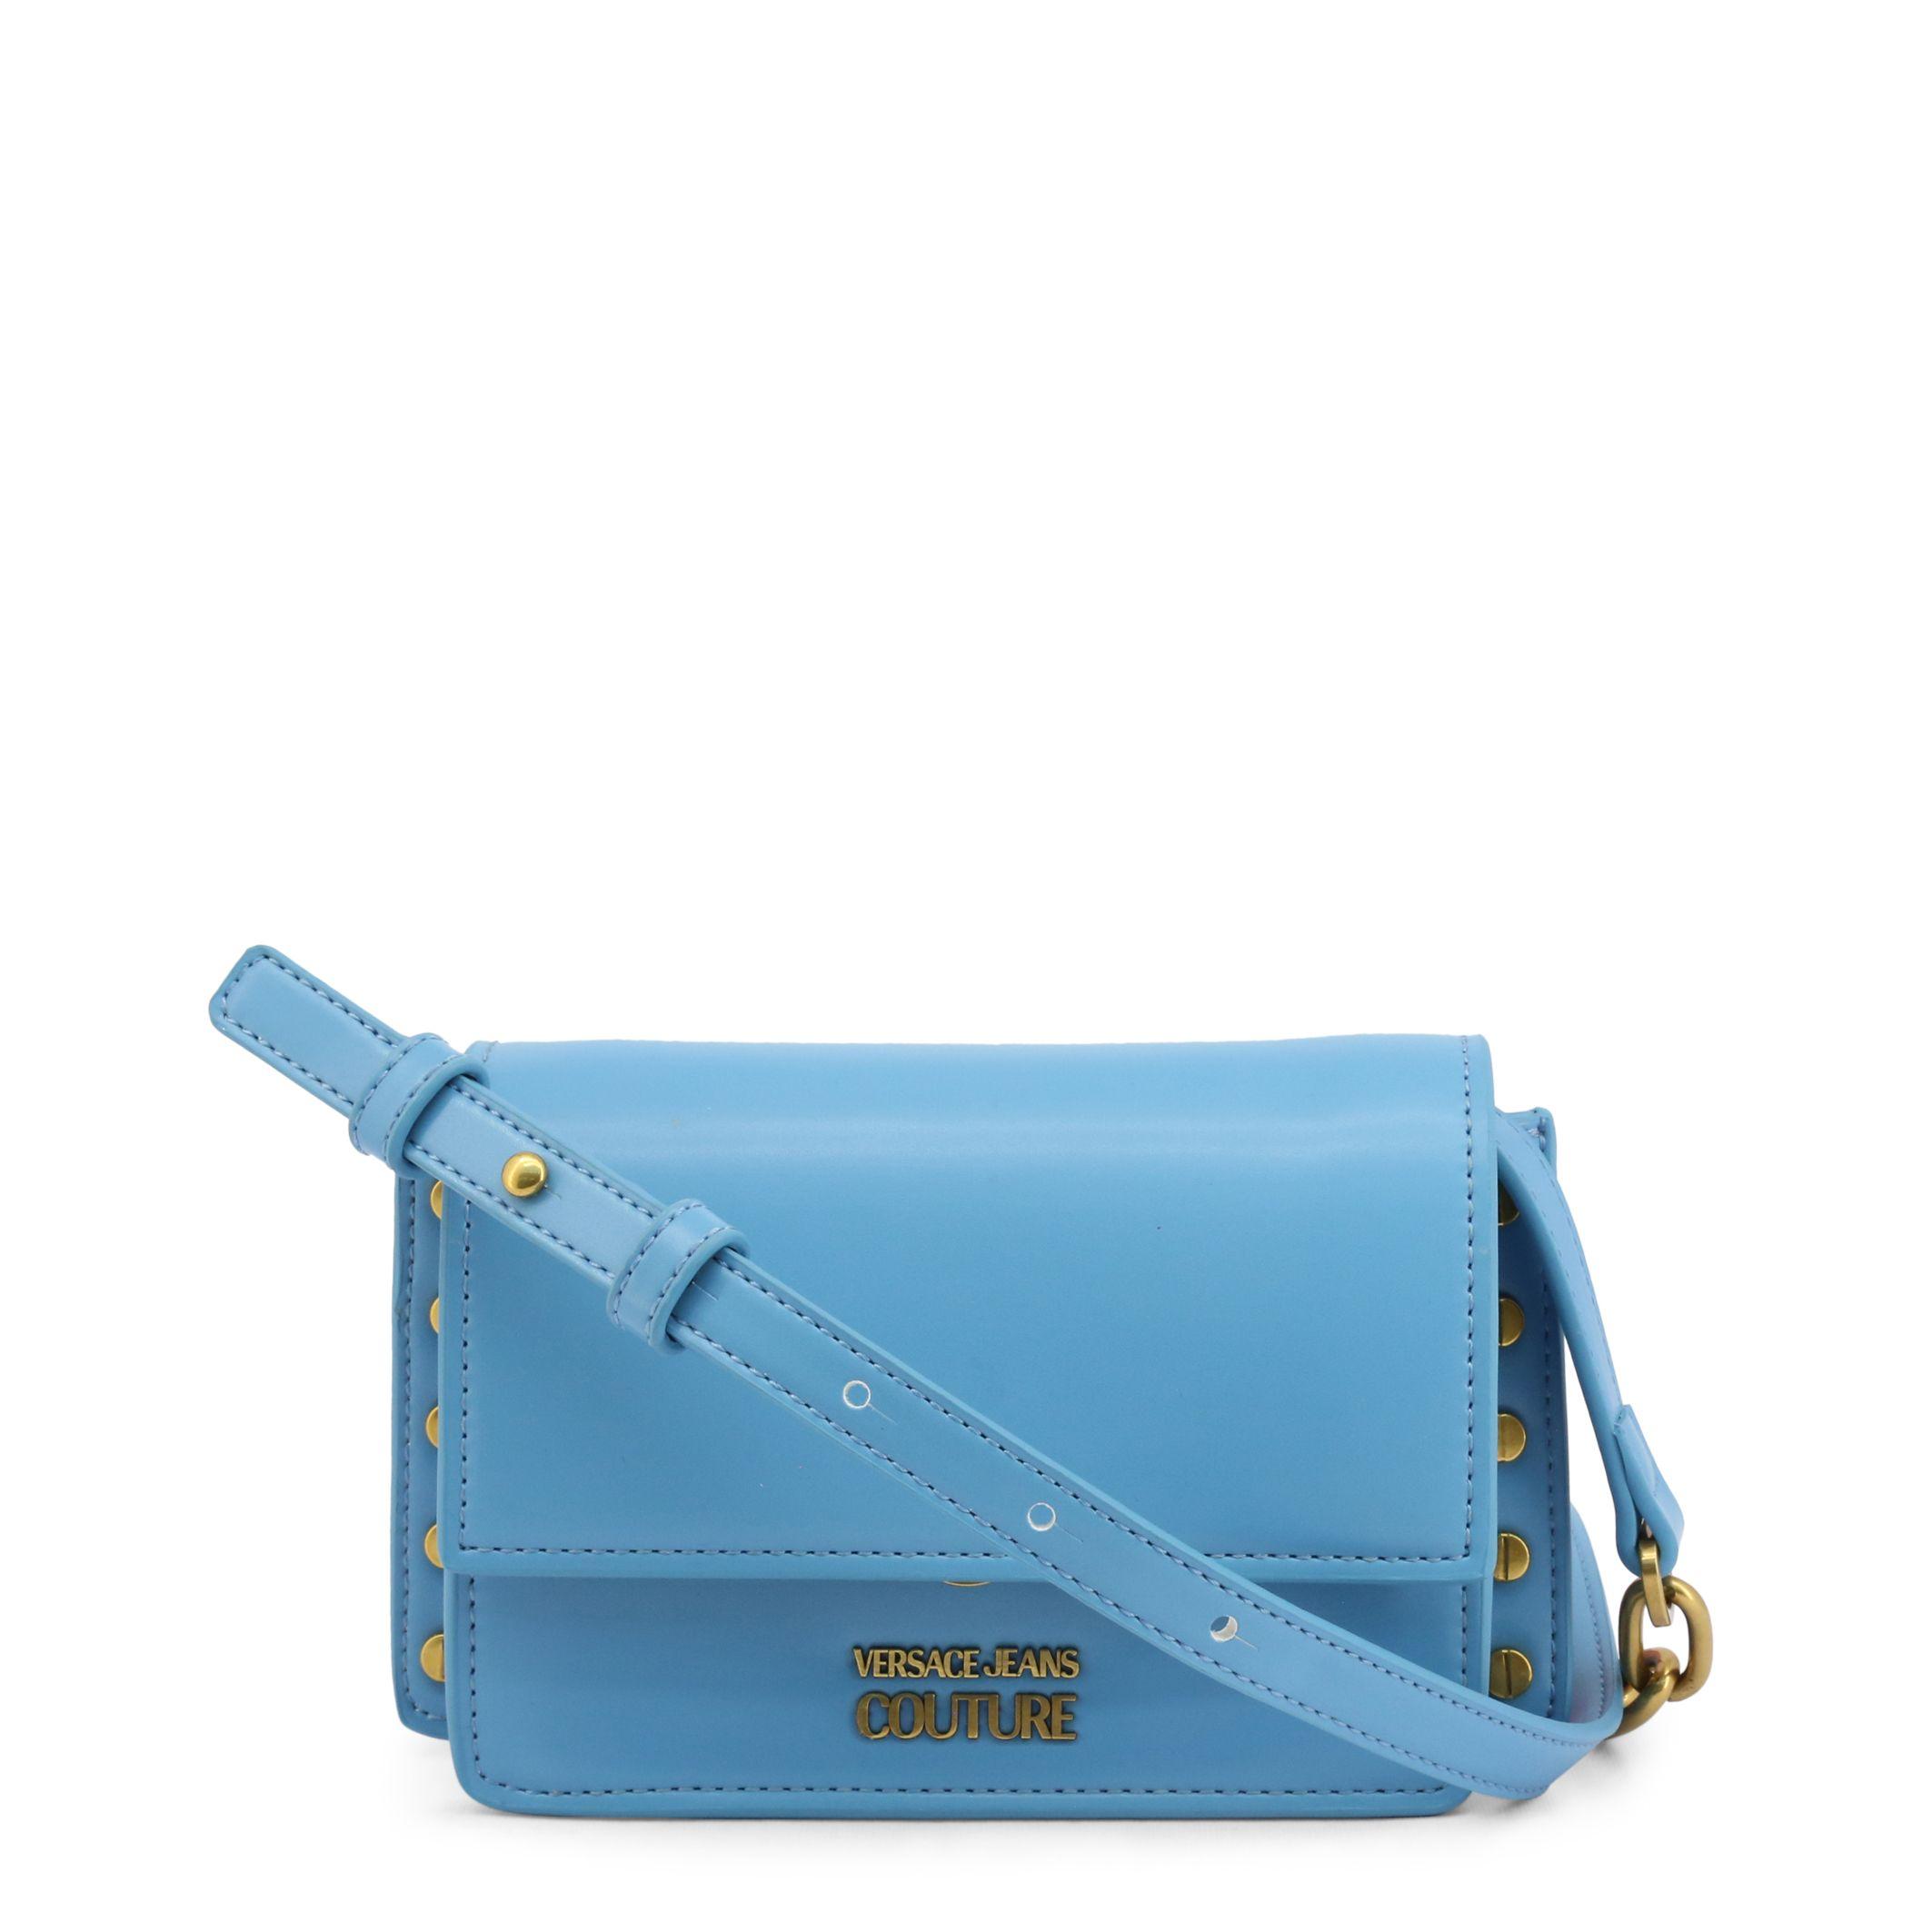 Versace Jeans – E1VWABC4_71876 – Azul